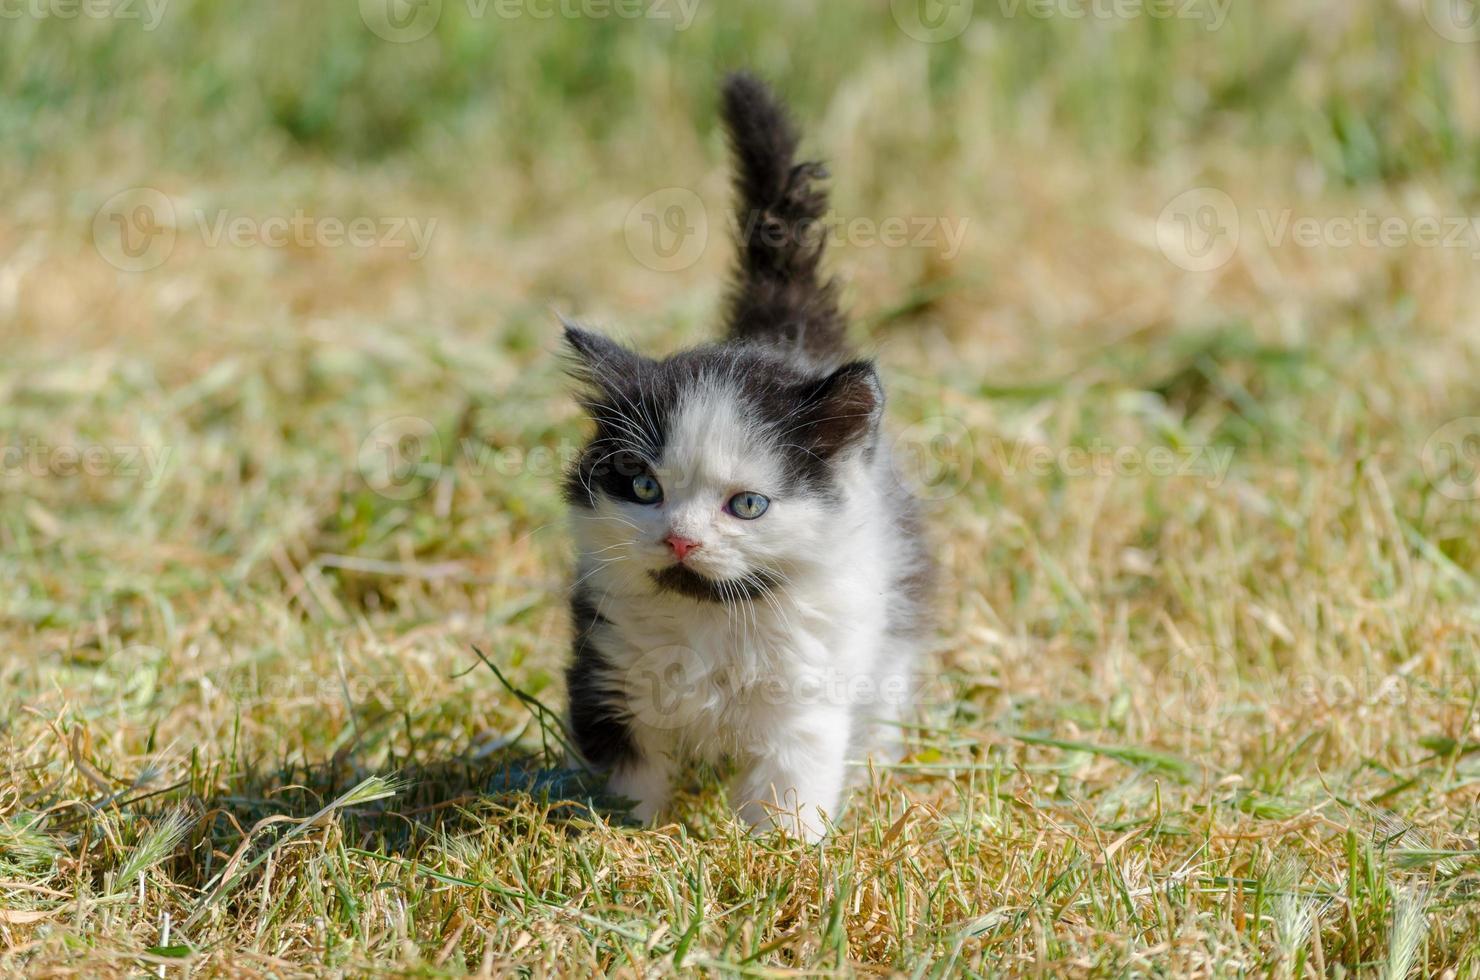 svartvit kattunge i gräset foto